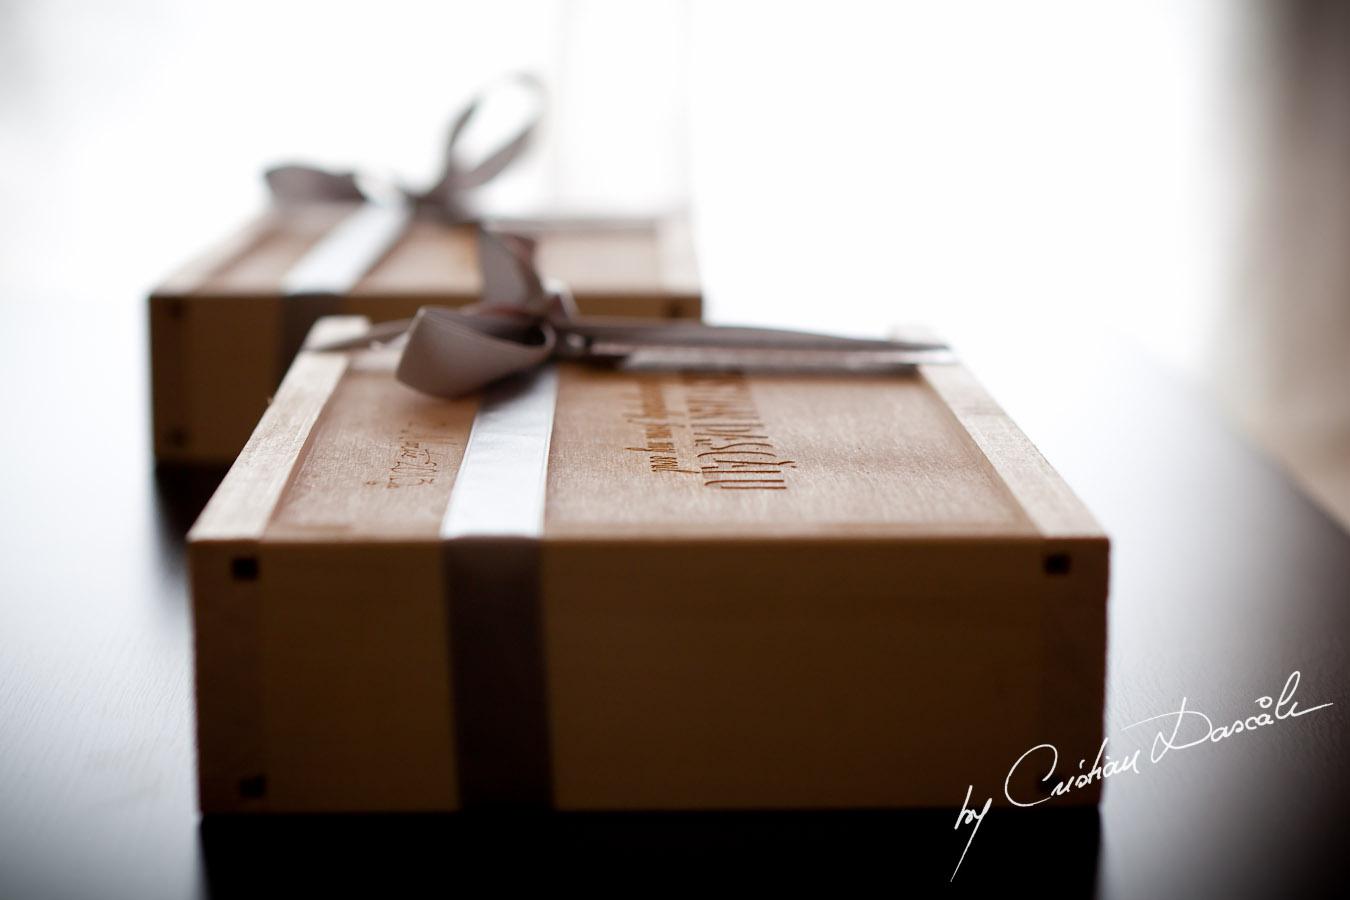 Cyprus Photographer Cristian Dascalu - Our custom packaging